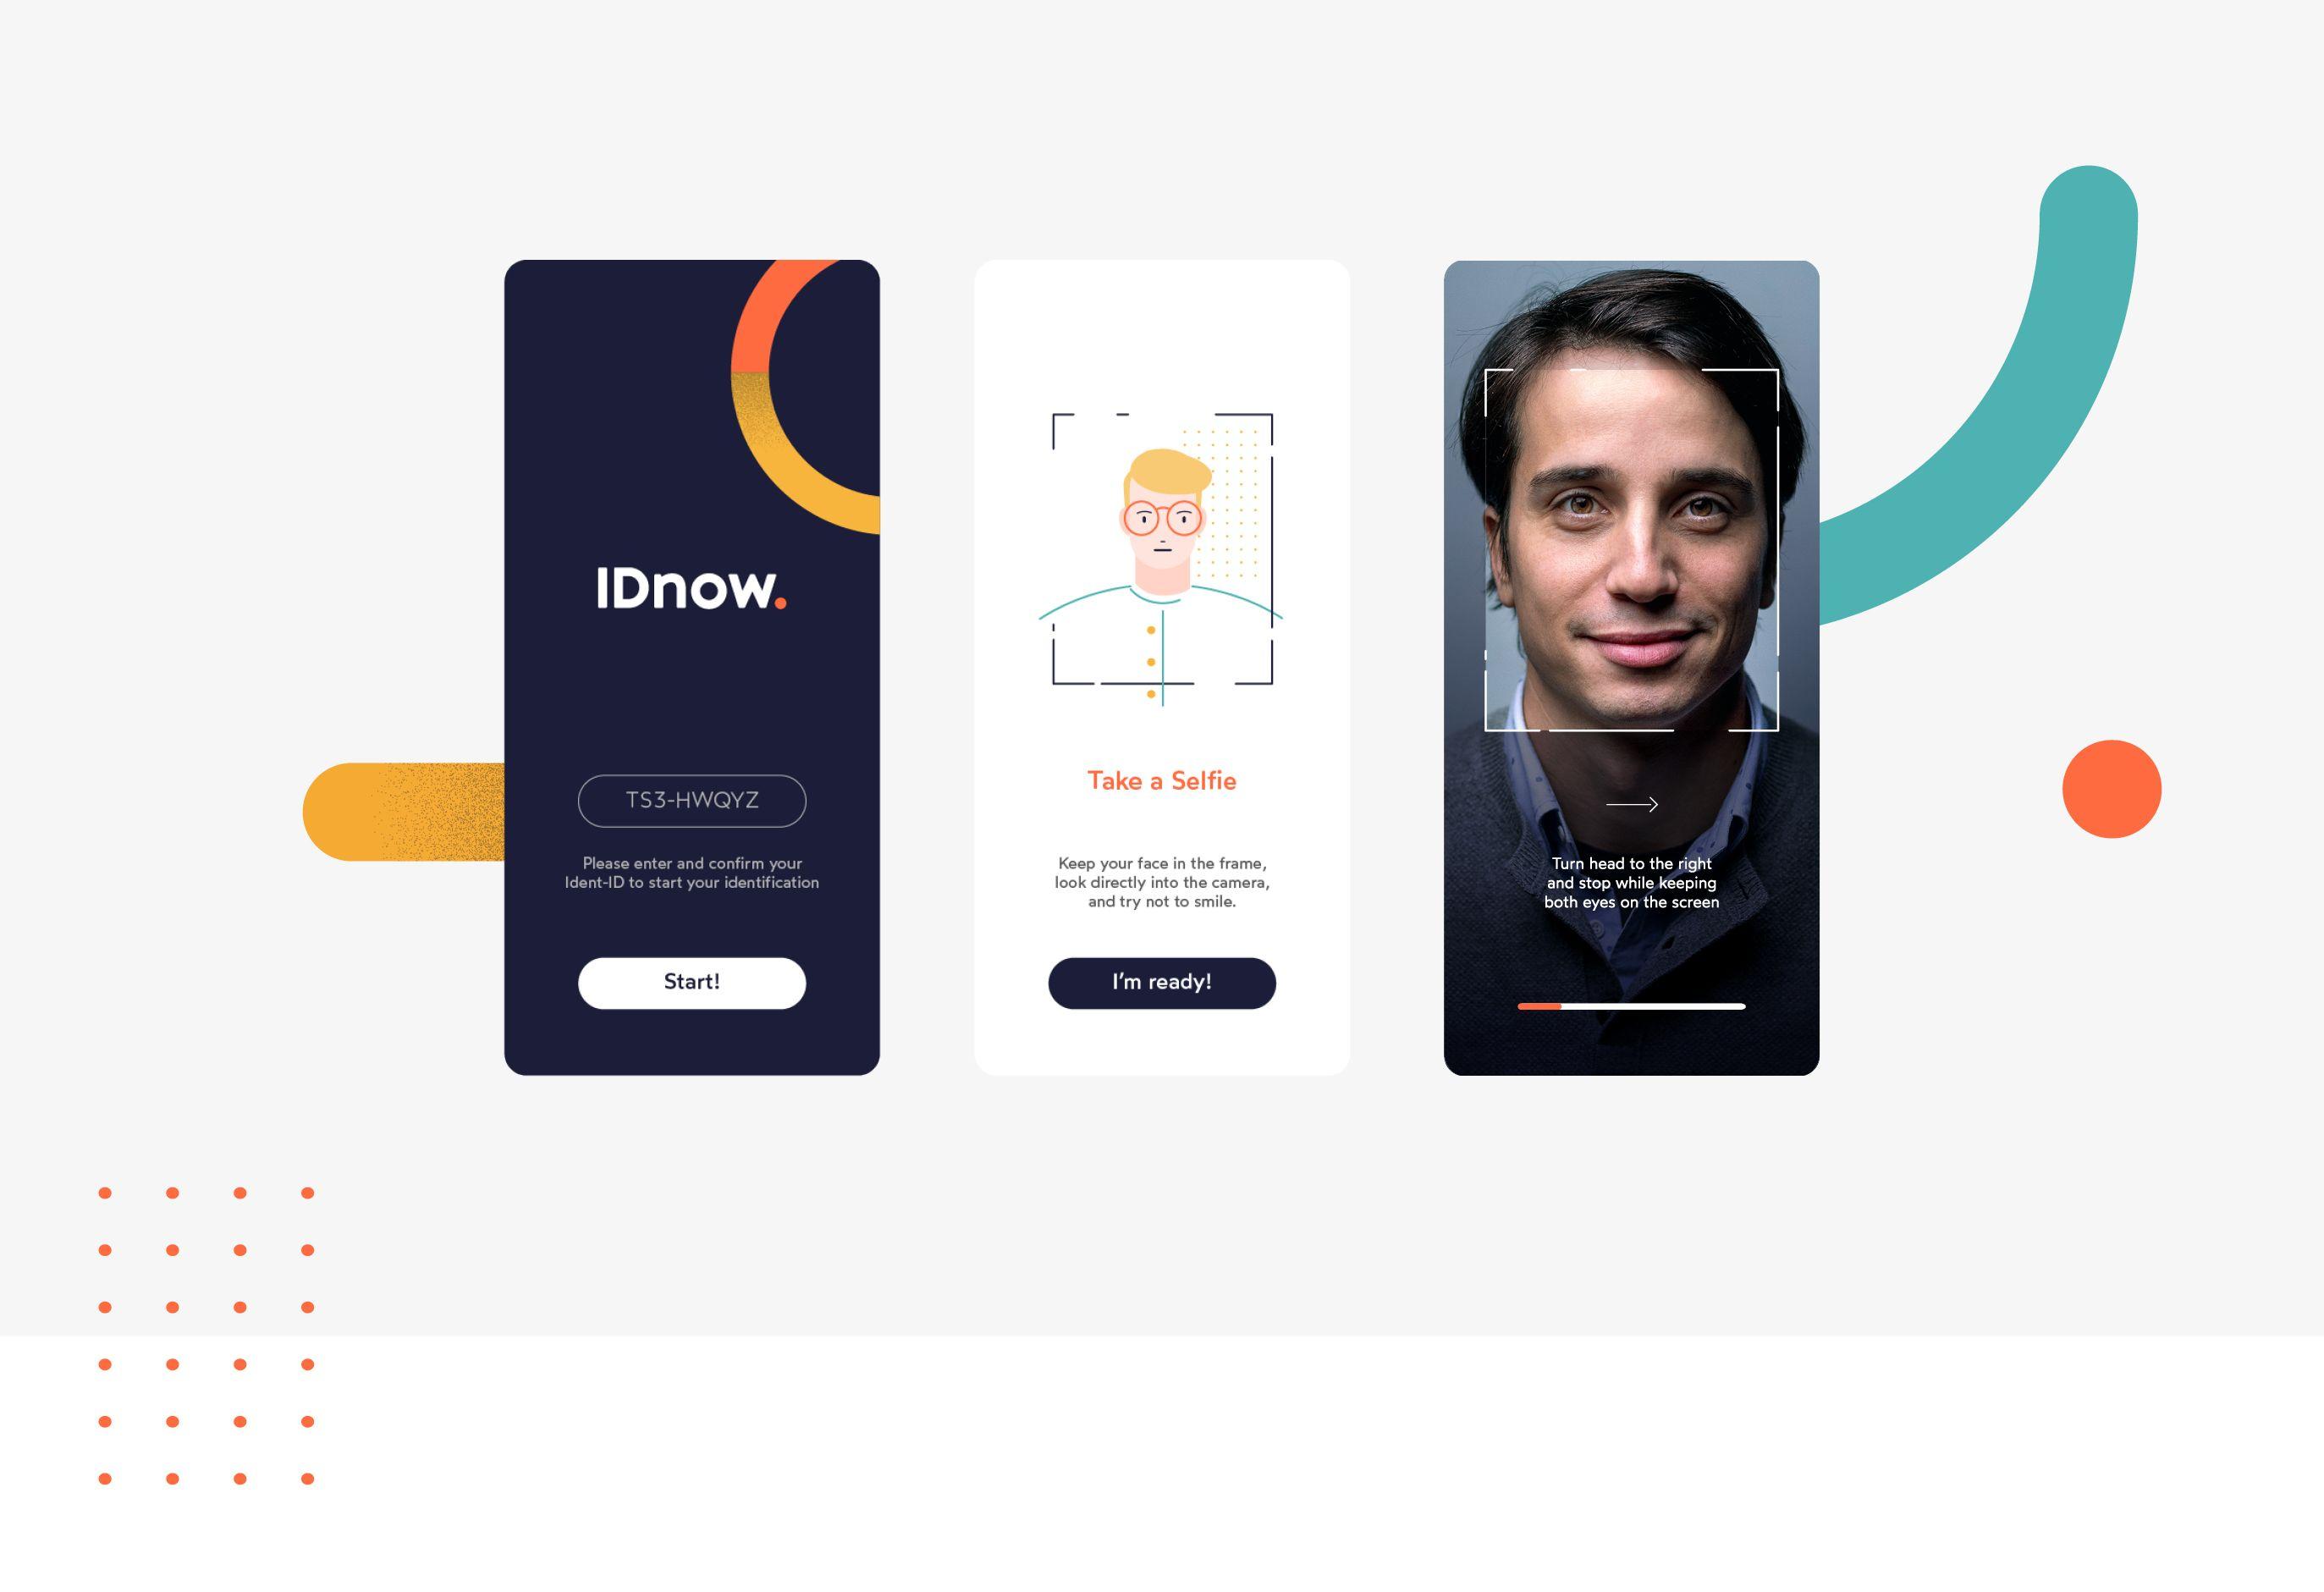 IDnow app screenshots